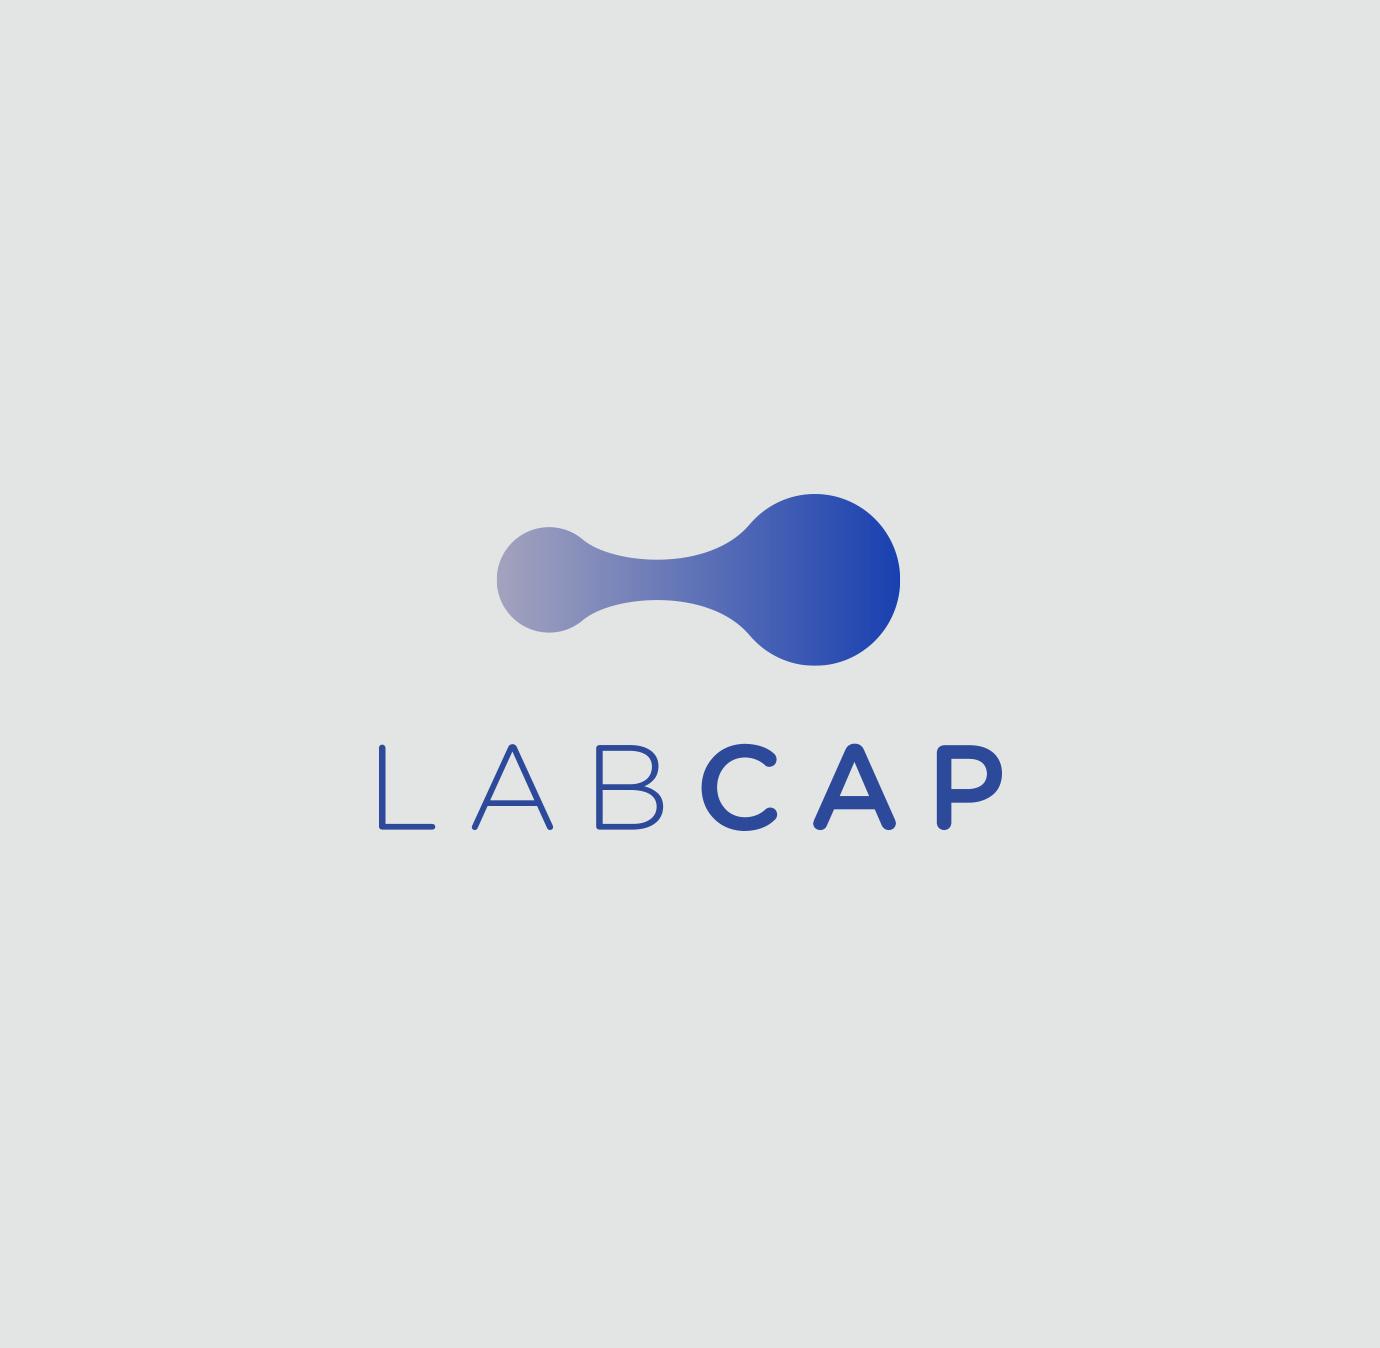 logo-labcap-yoenpaperland